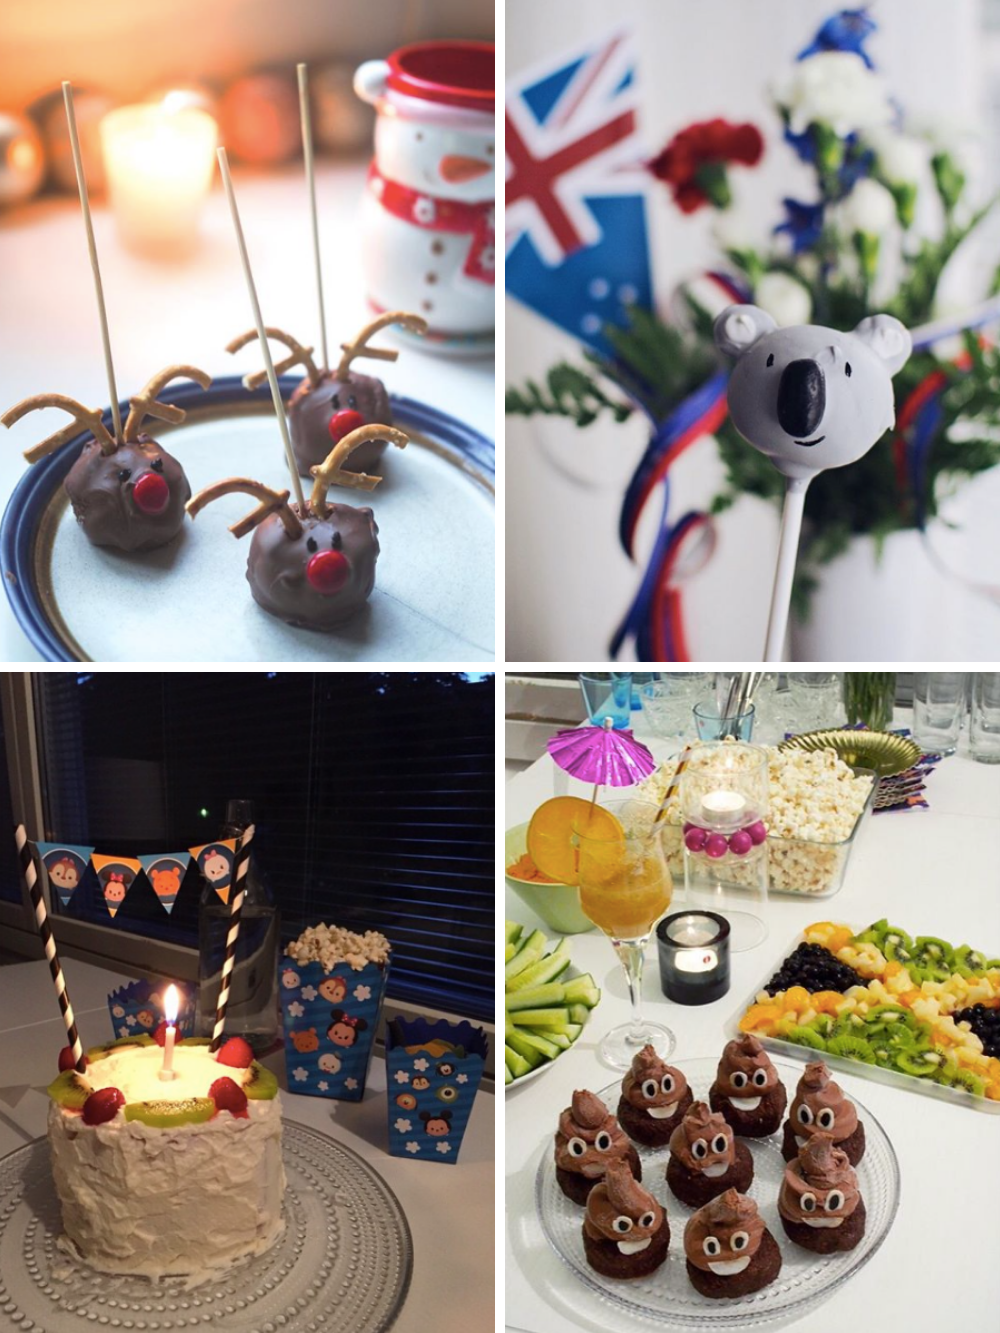 miffan-juhlat-poro-cakepops-koala-tsumtsum-poop-emoji-cupcakes.png